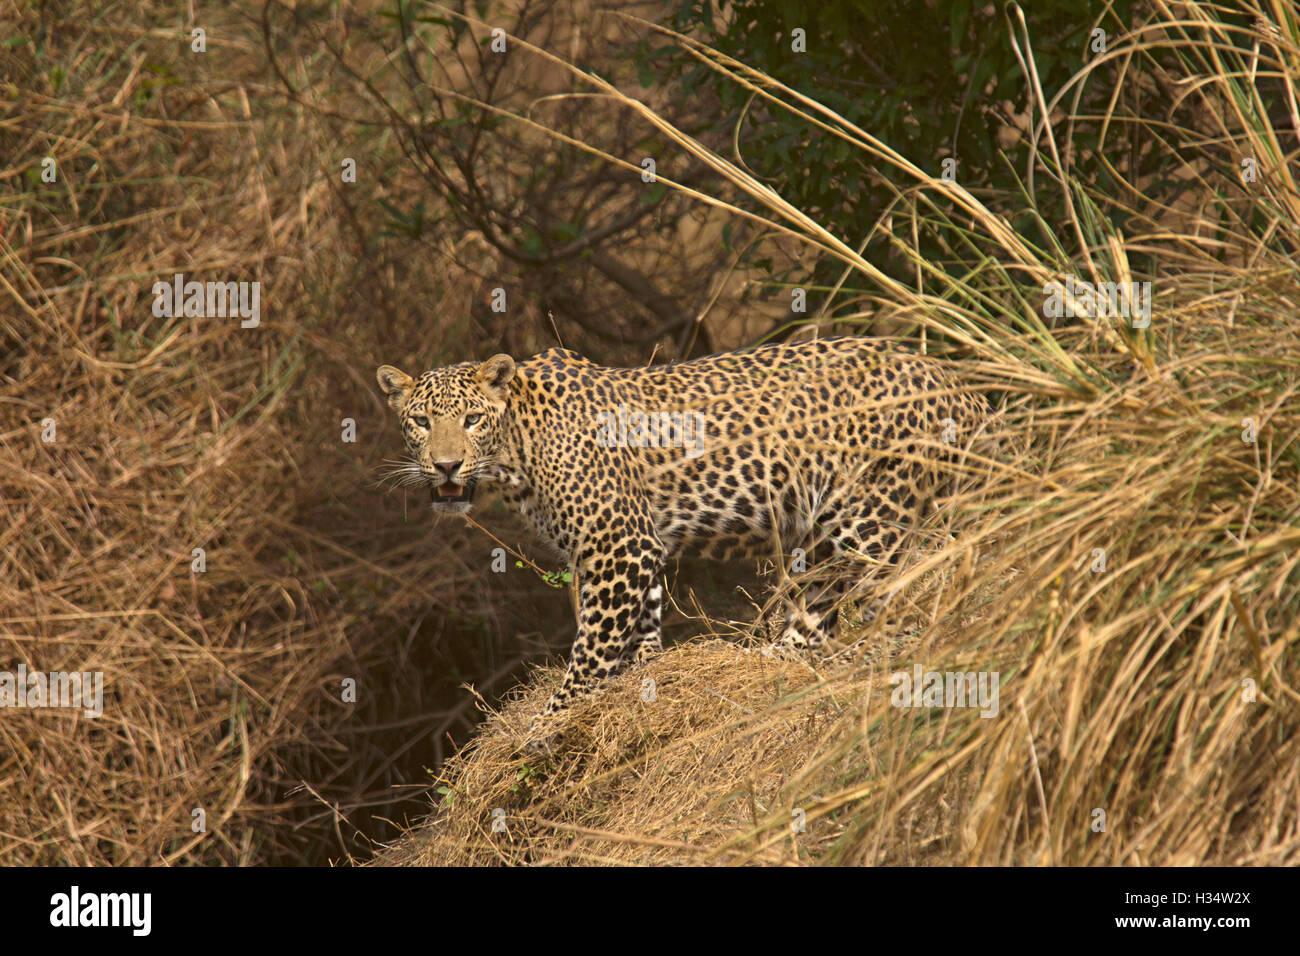 Indian Leopard, Panthera pardus fusca, Panna Tiger Reserve, Madhya Pradesh, India - Stock Image